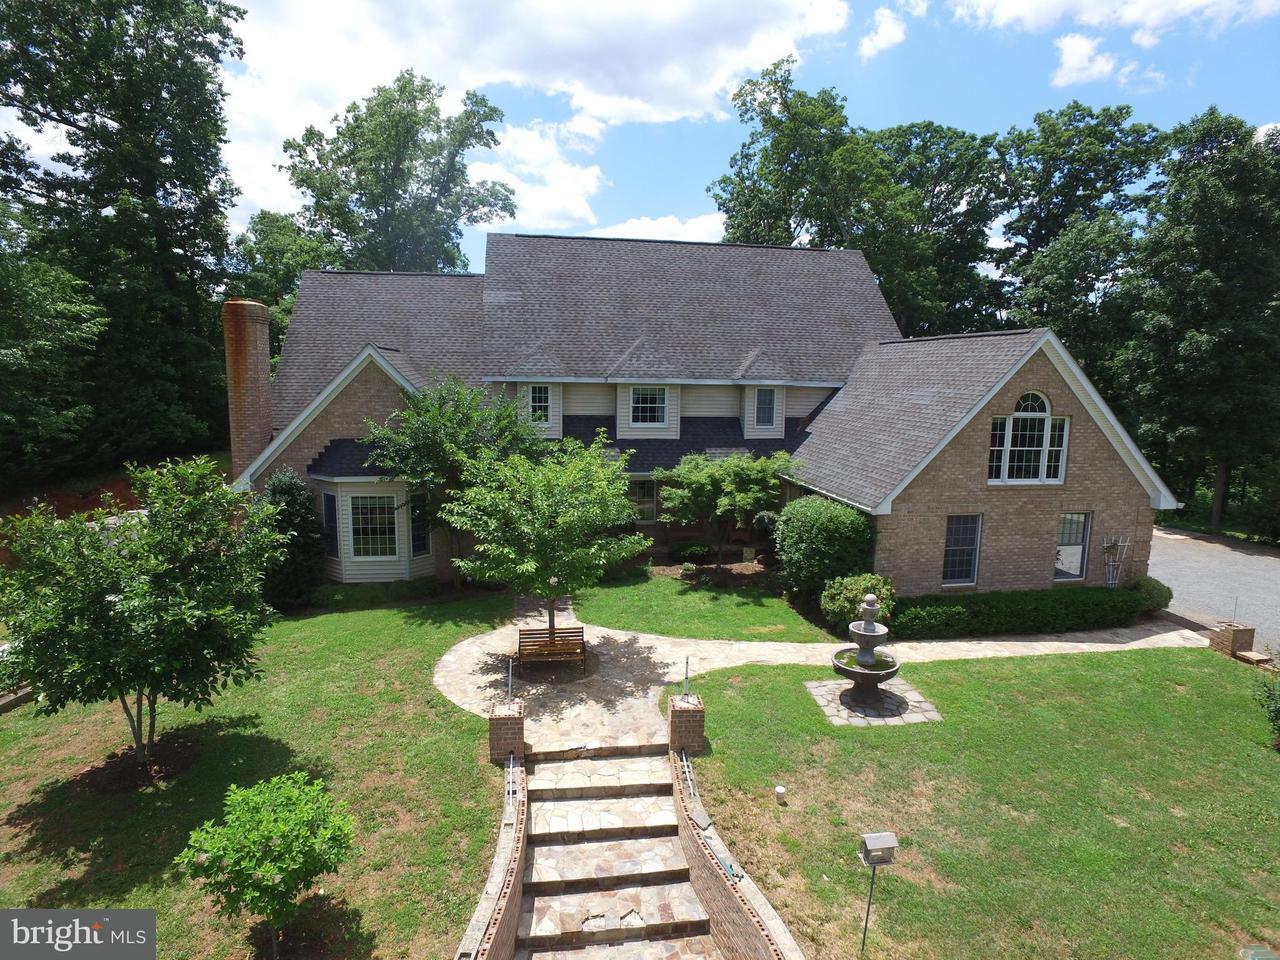 Casa Unifamiliar por un Venta en 10952 MOUNTAIN RUN LAKE Road 10952 MOUNTAIN RUN LAKE Road Culpeper, Virginia 22701 Estados Unidos